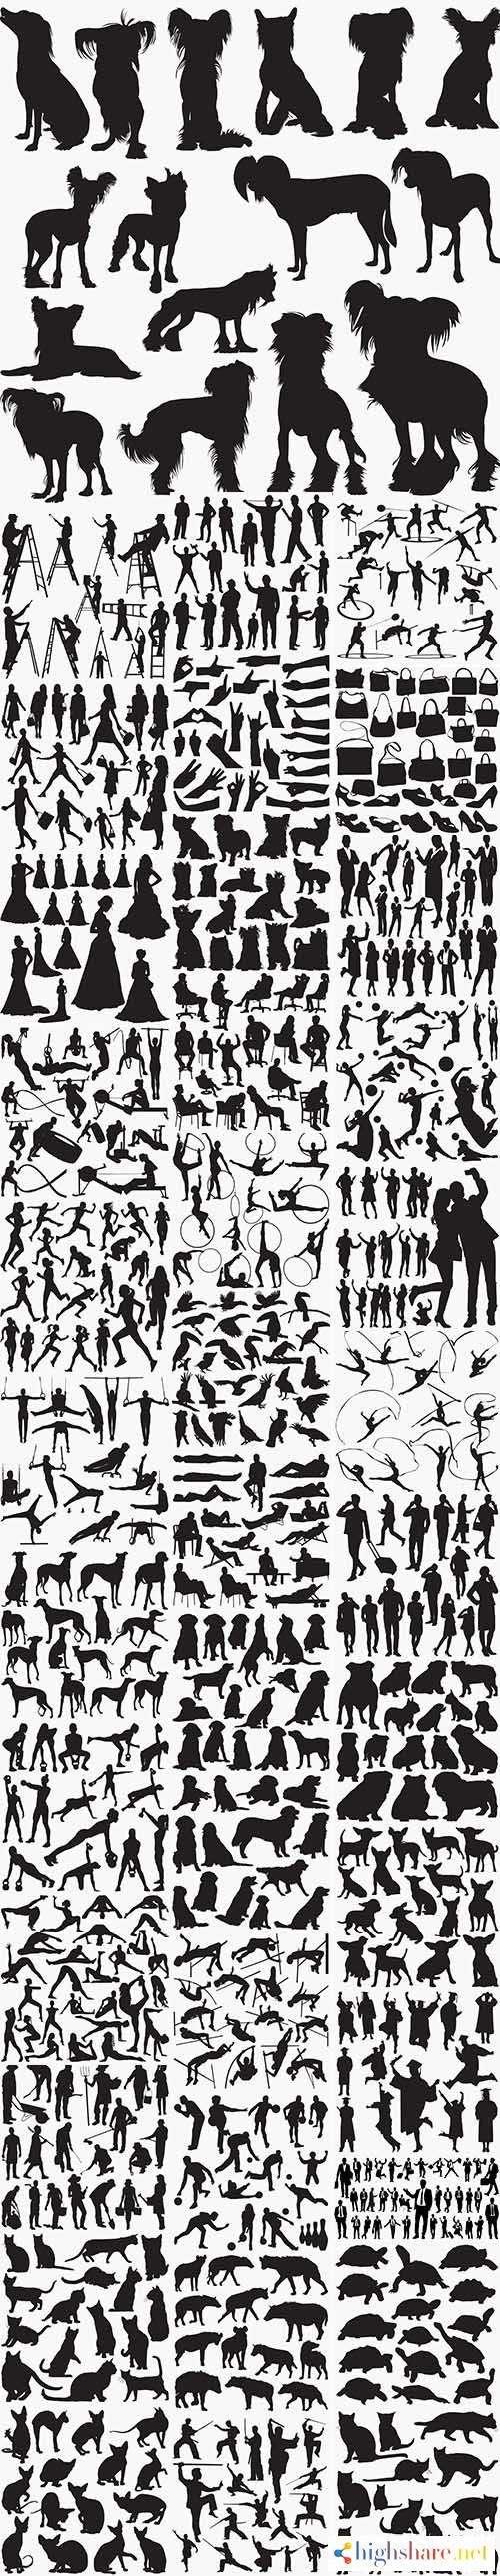 39 set in 1 bundle black silhouettes 5f42297589284 - 39 Set in 1 Bundle - Black Silhouettes